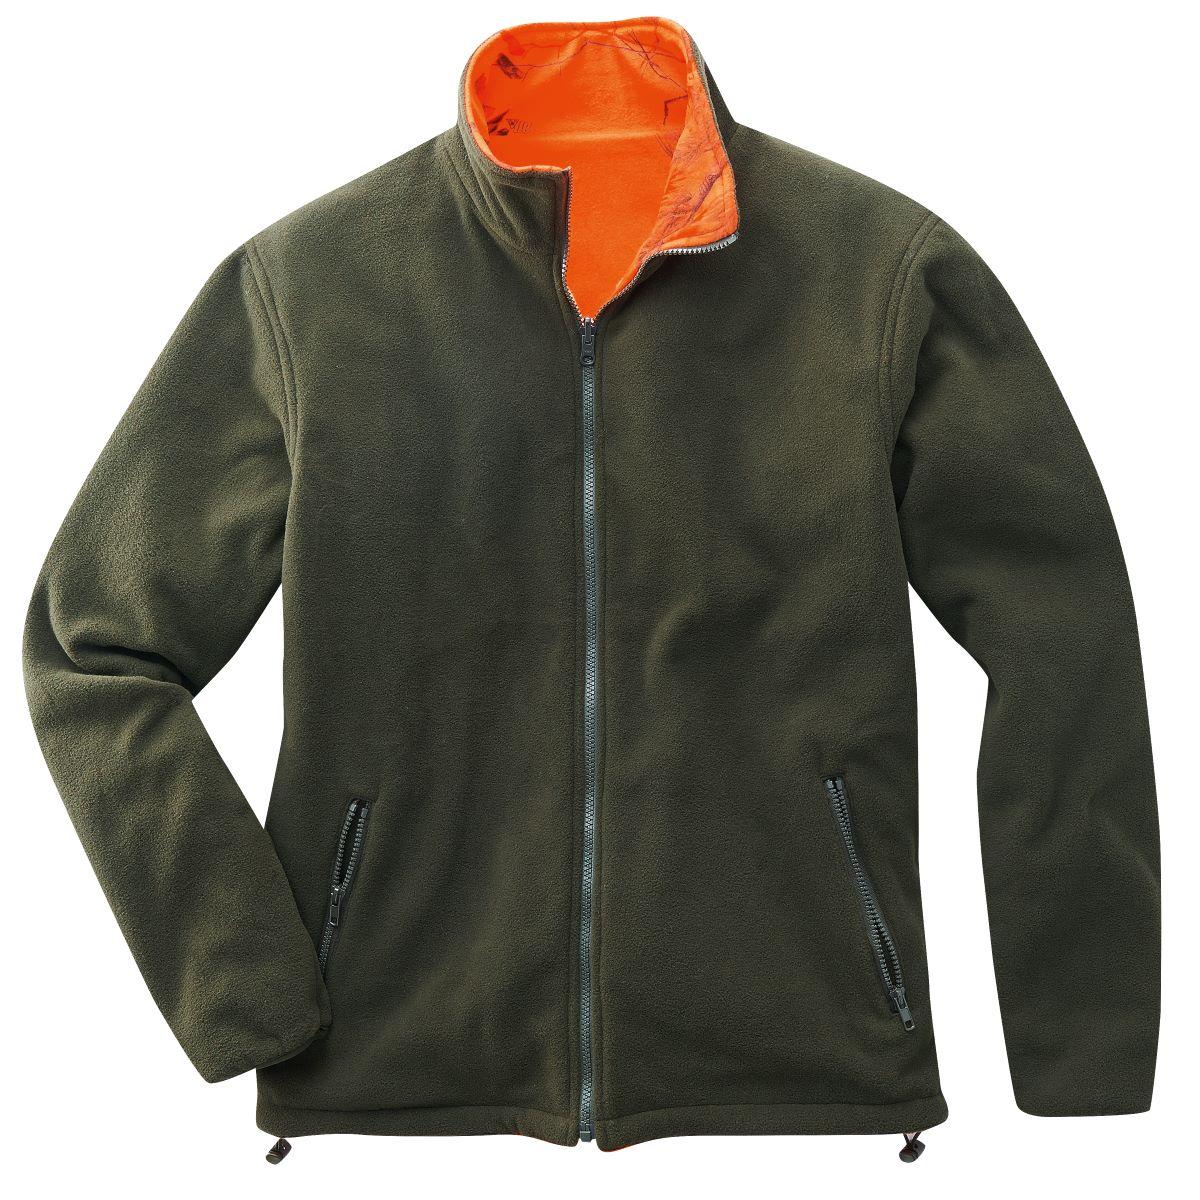 WILLOW oboustrana bunda fleece 8190 L